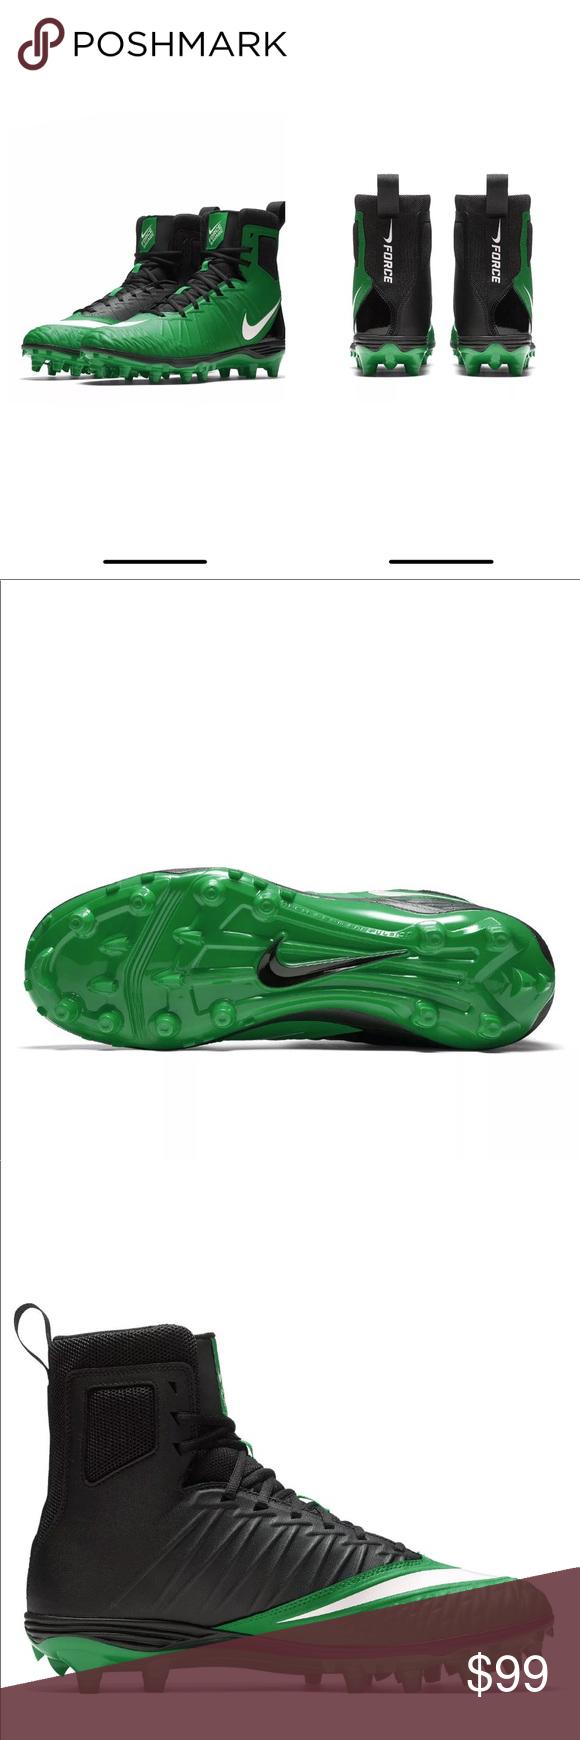 "big sale 05744 cbead Nike Force Savage Varsity Football Cleats Green 10 Nike Force Savage Varsity  Mens High Top Football Cleats Green/Black ""Sz 10"" NEW! S-5 Nike Shoes  Athletic ..."